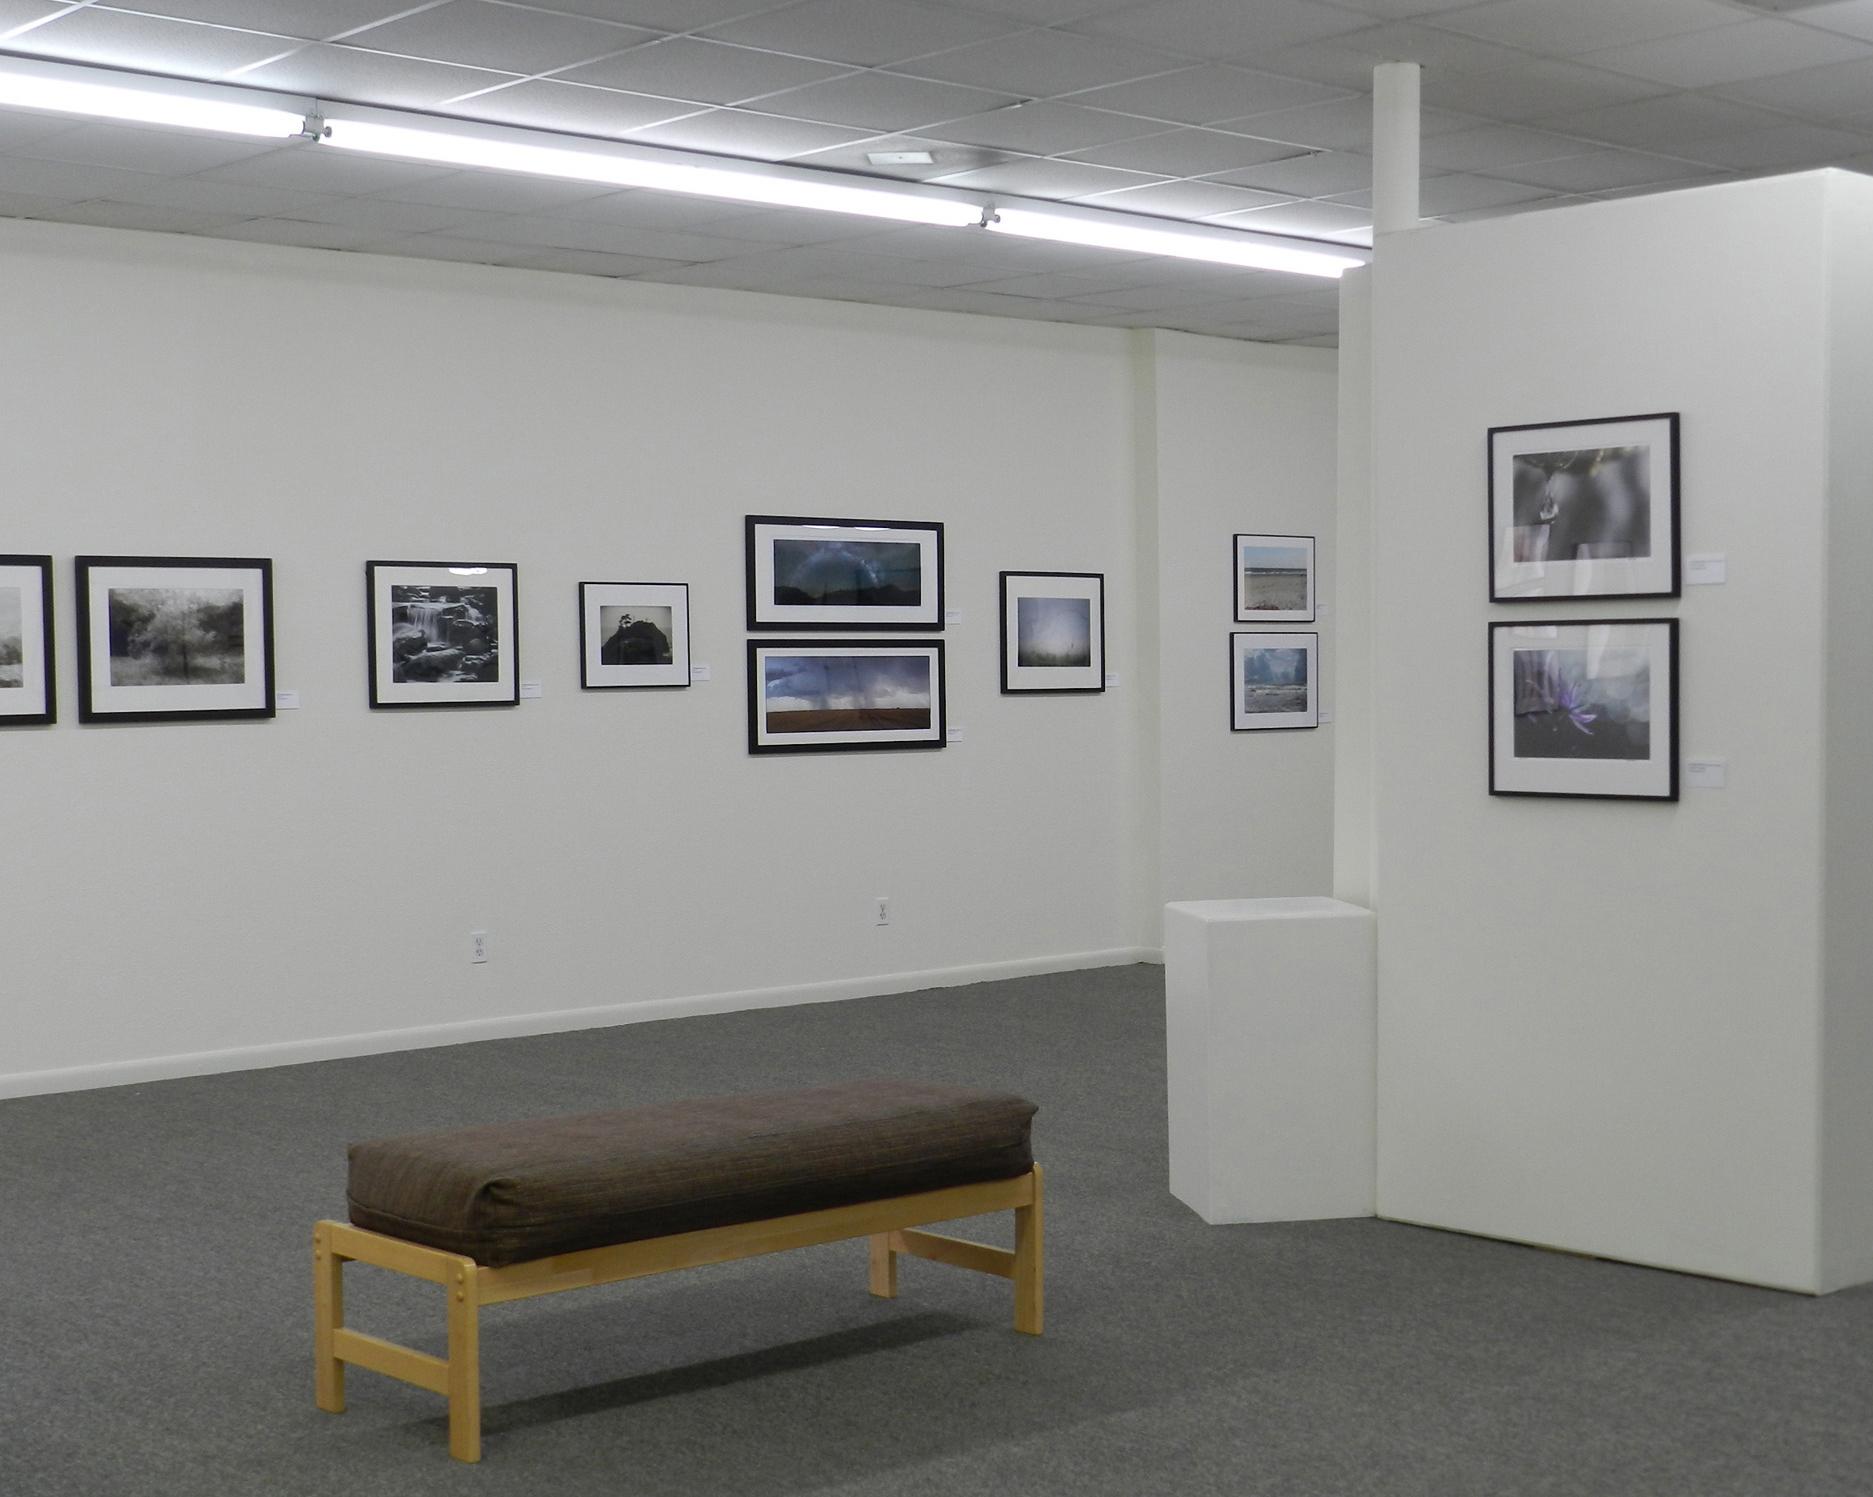 Art League of Baytown - 2016